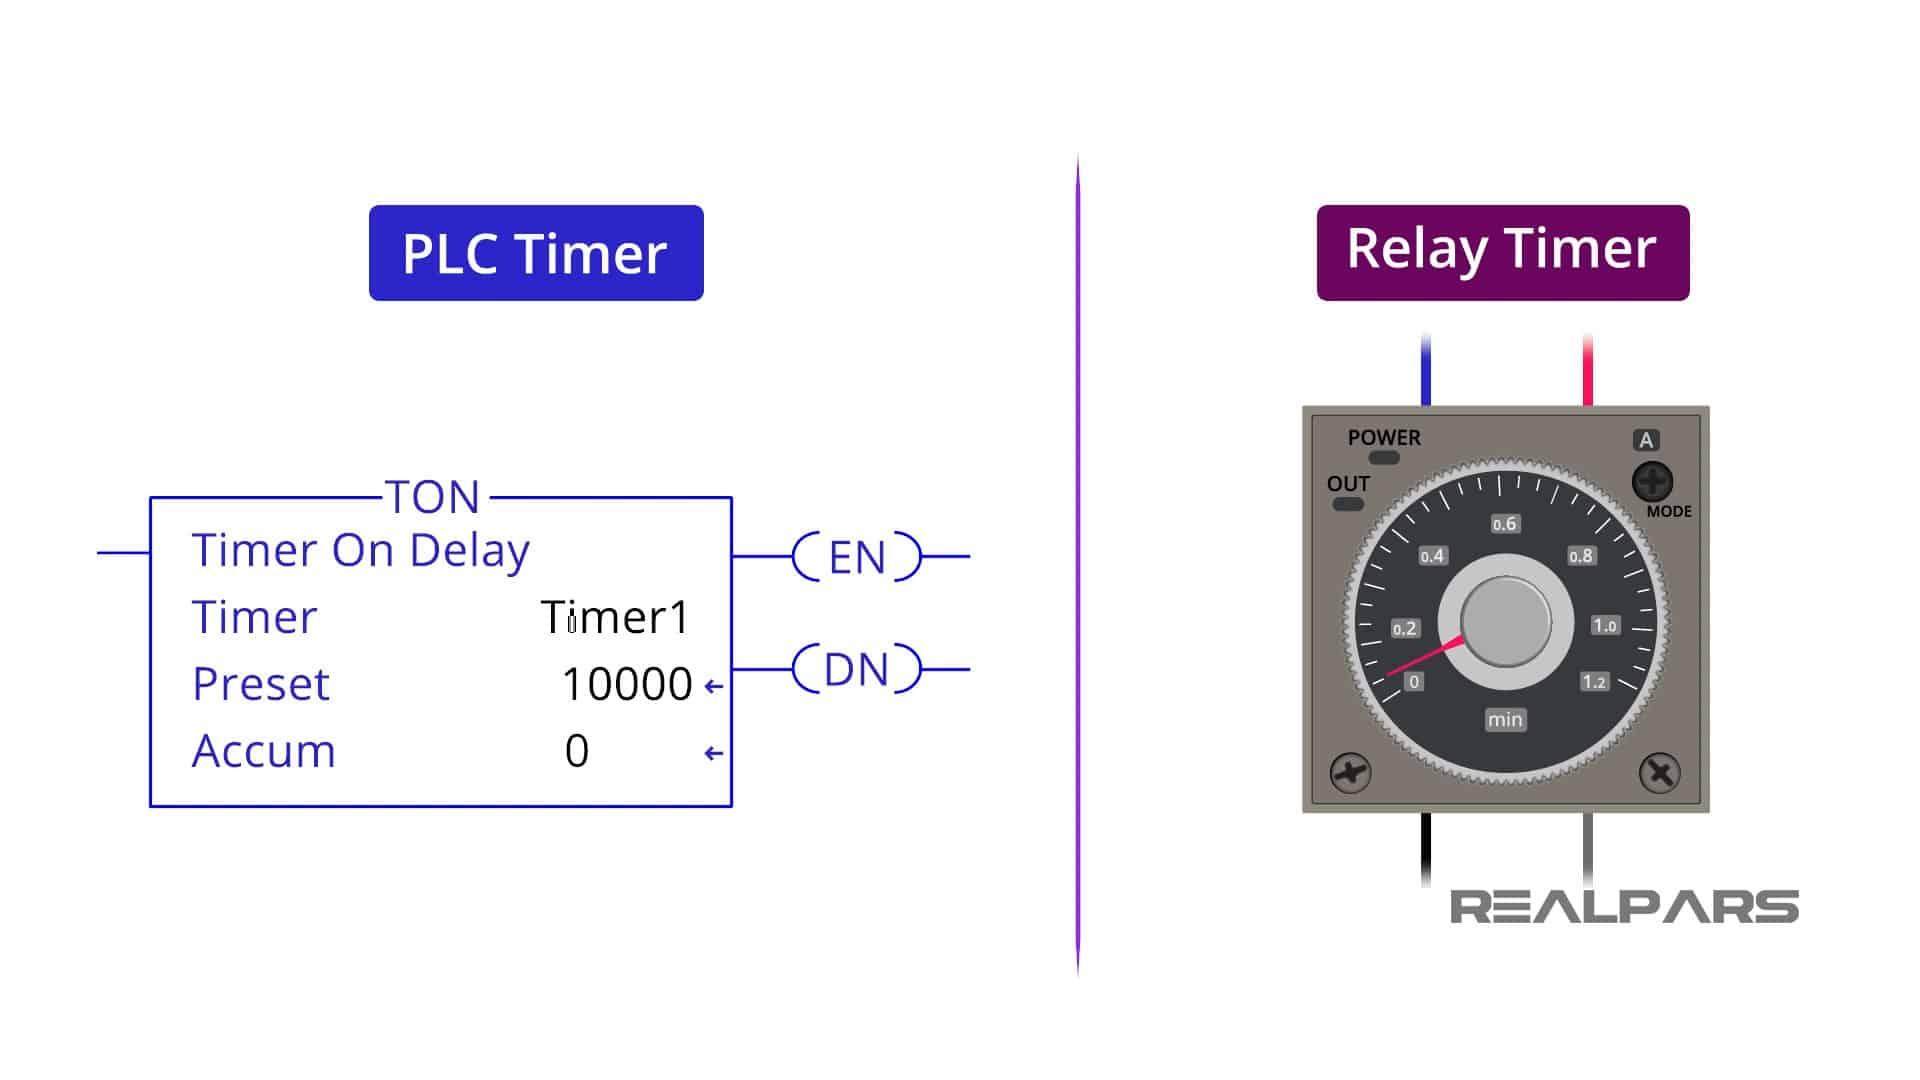 PLC-timers